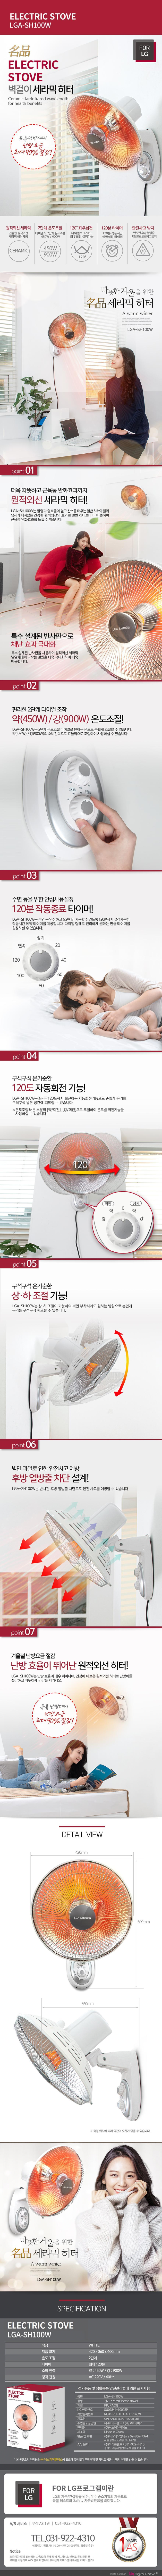 For LG LGA-SH100W